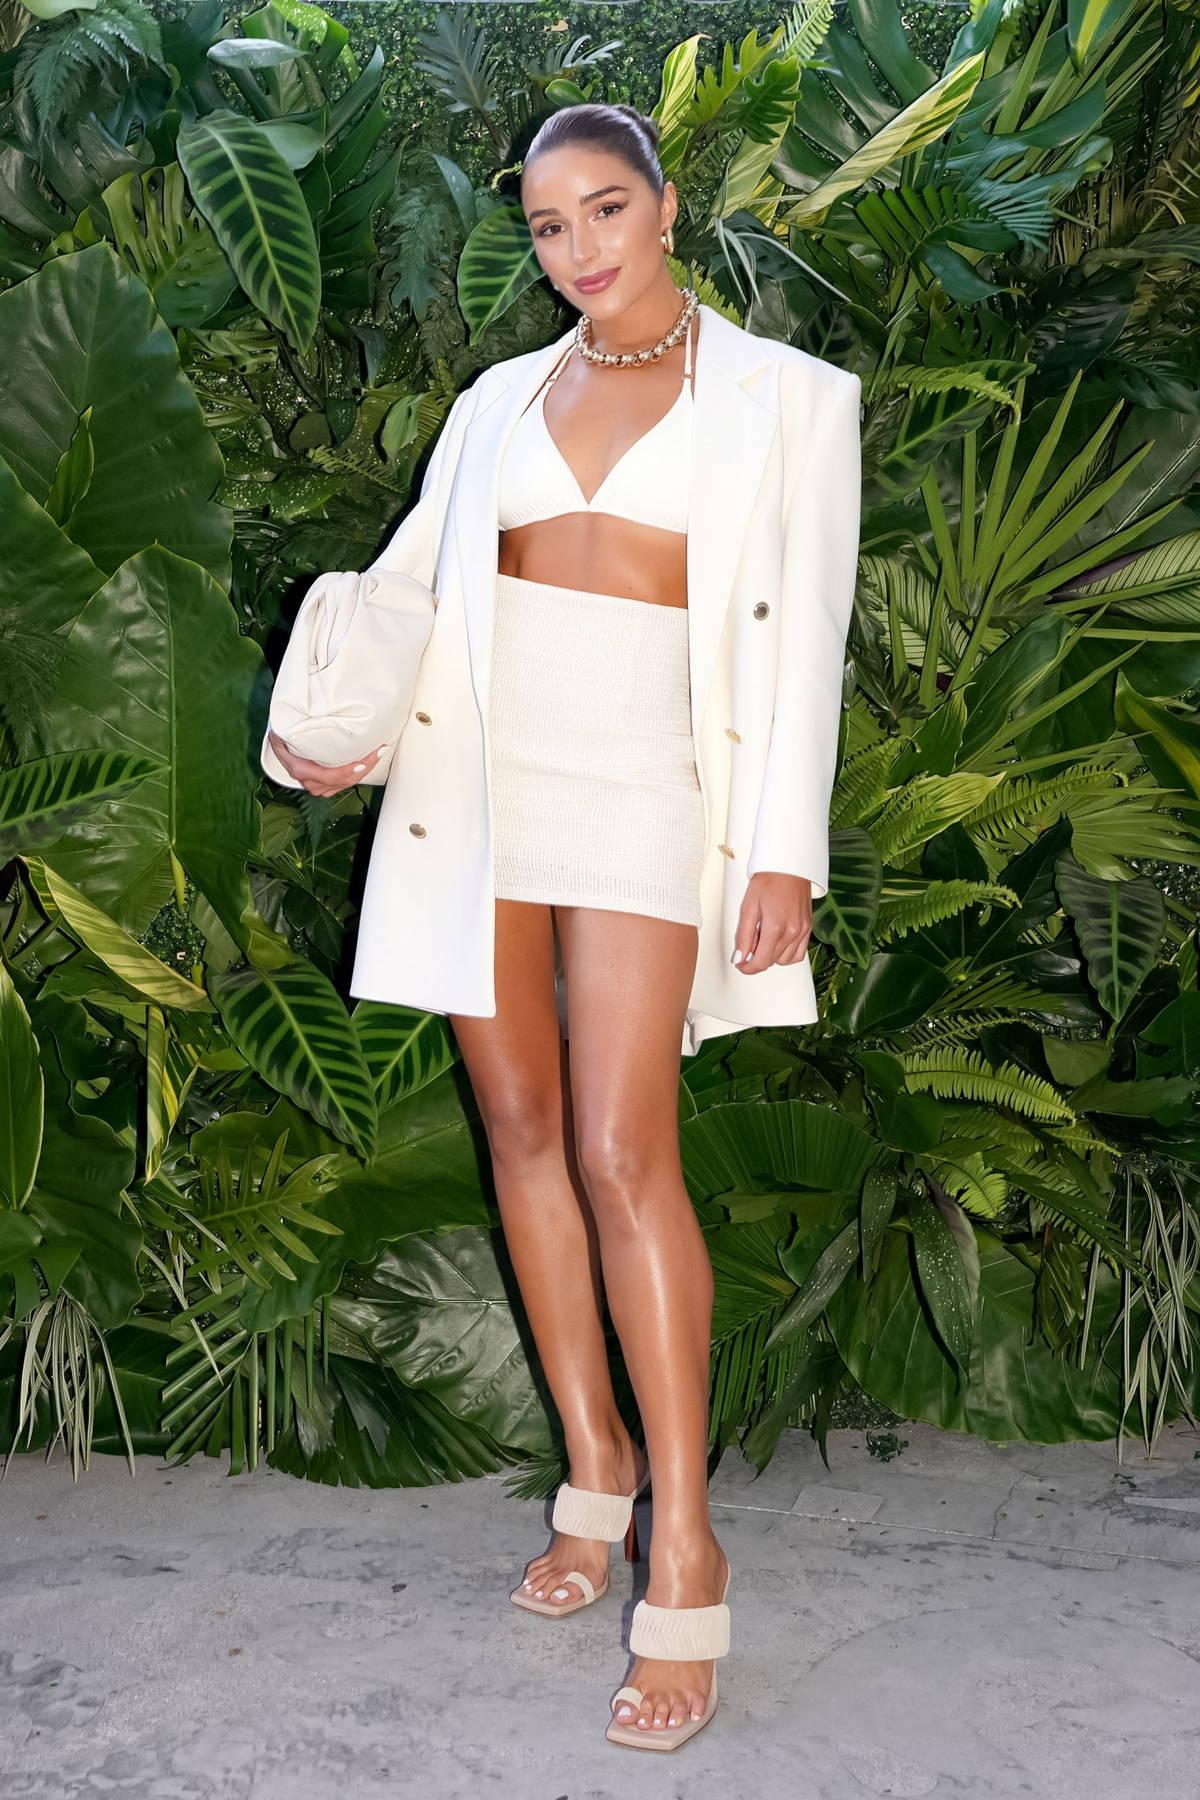 Olivia Culpo attends Celsius Tropical Vibe launch event in Miami, Florida